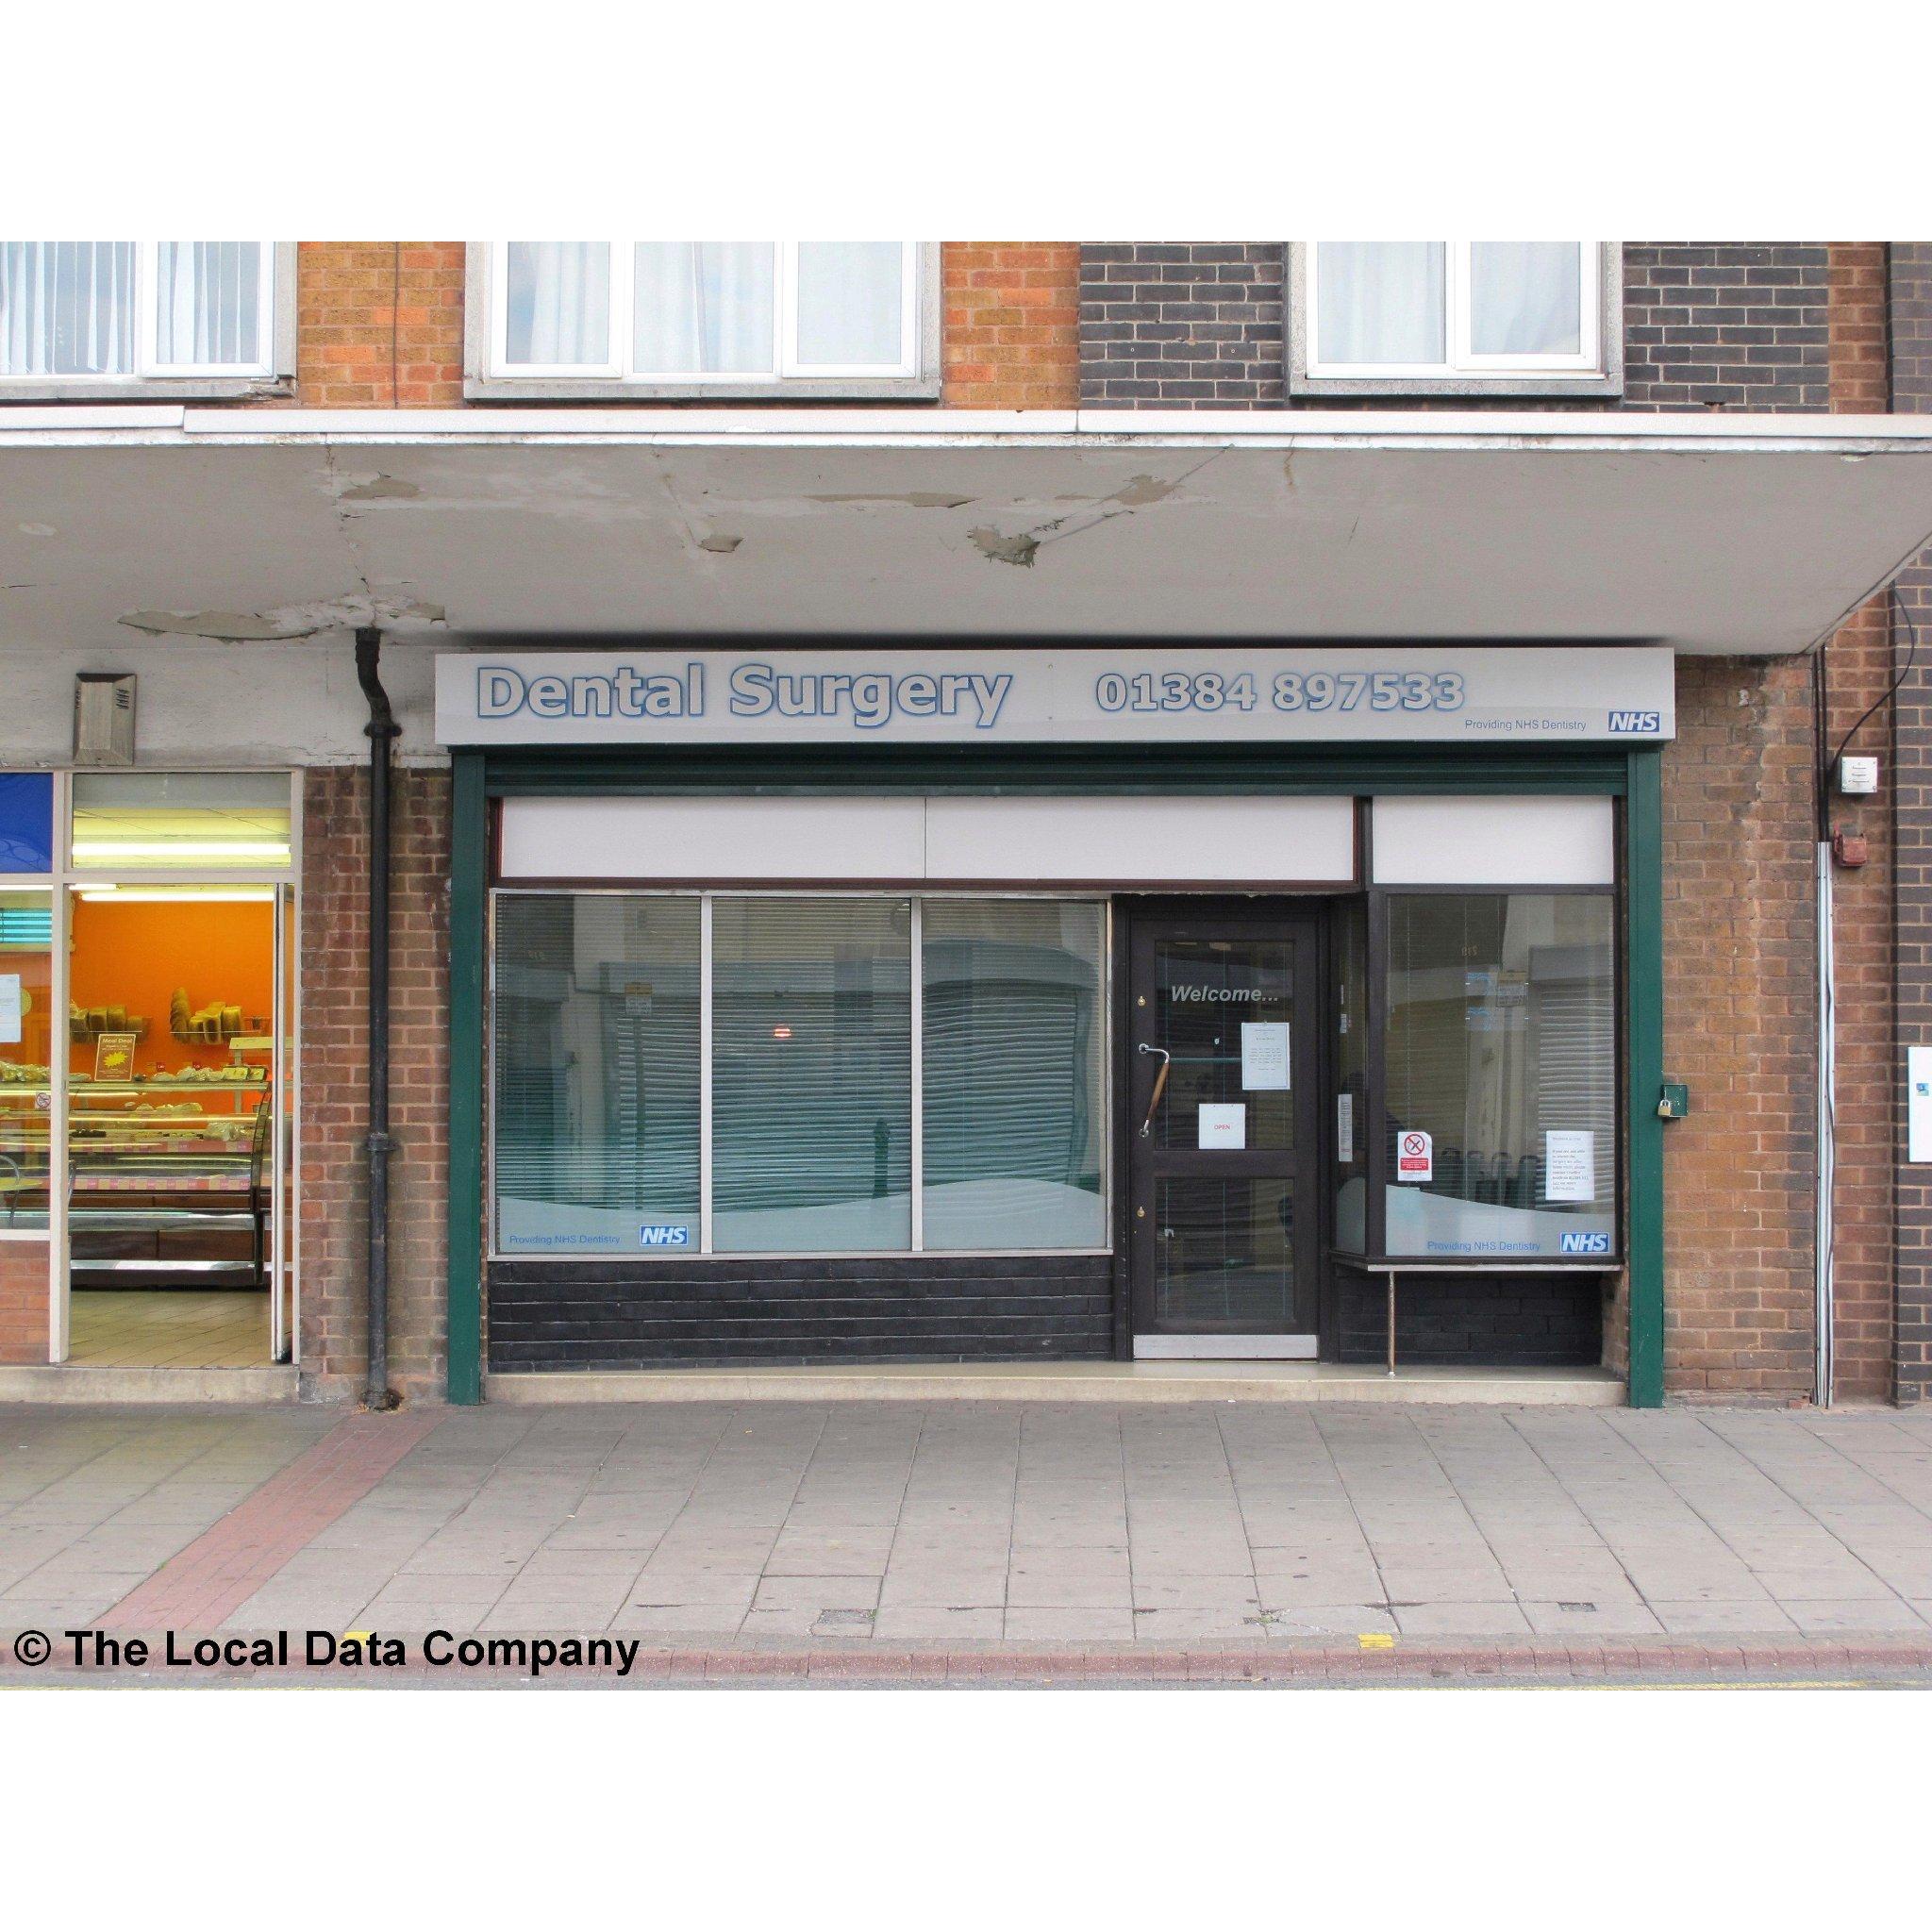 Dentists Near Me in Stourbridge West Midlands